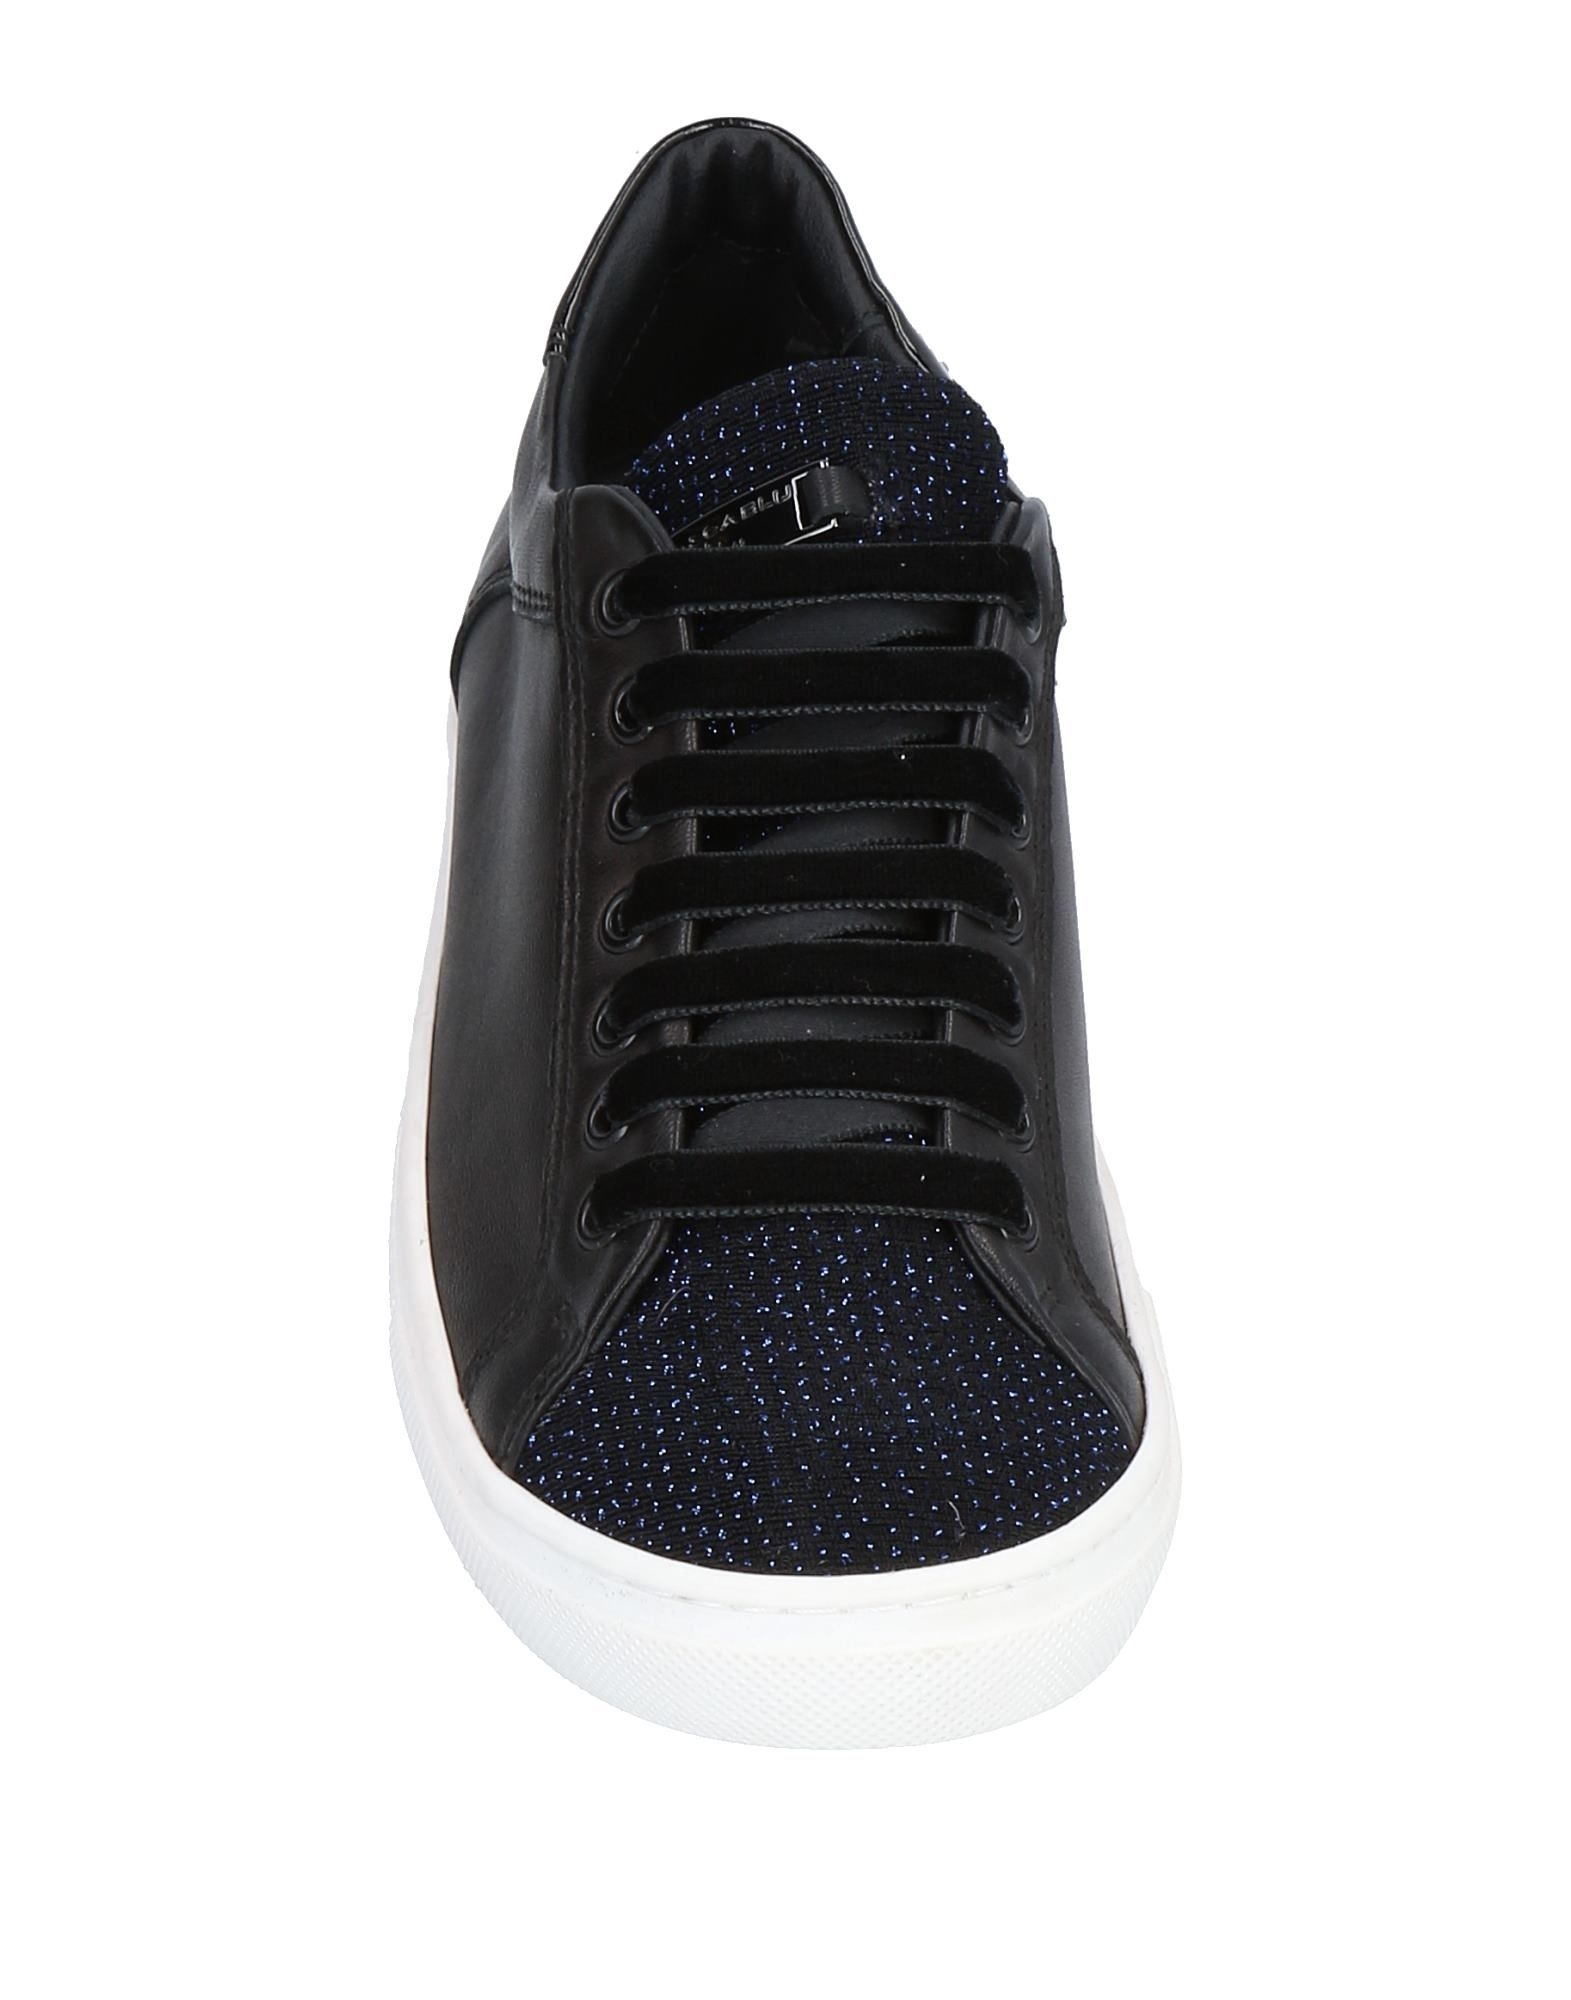 Tosca Blu Shoes Qualität Sneakers Damen  11491080RM Gute Qualität Shoes beliebte Schuhe d2912c